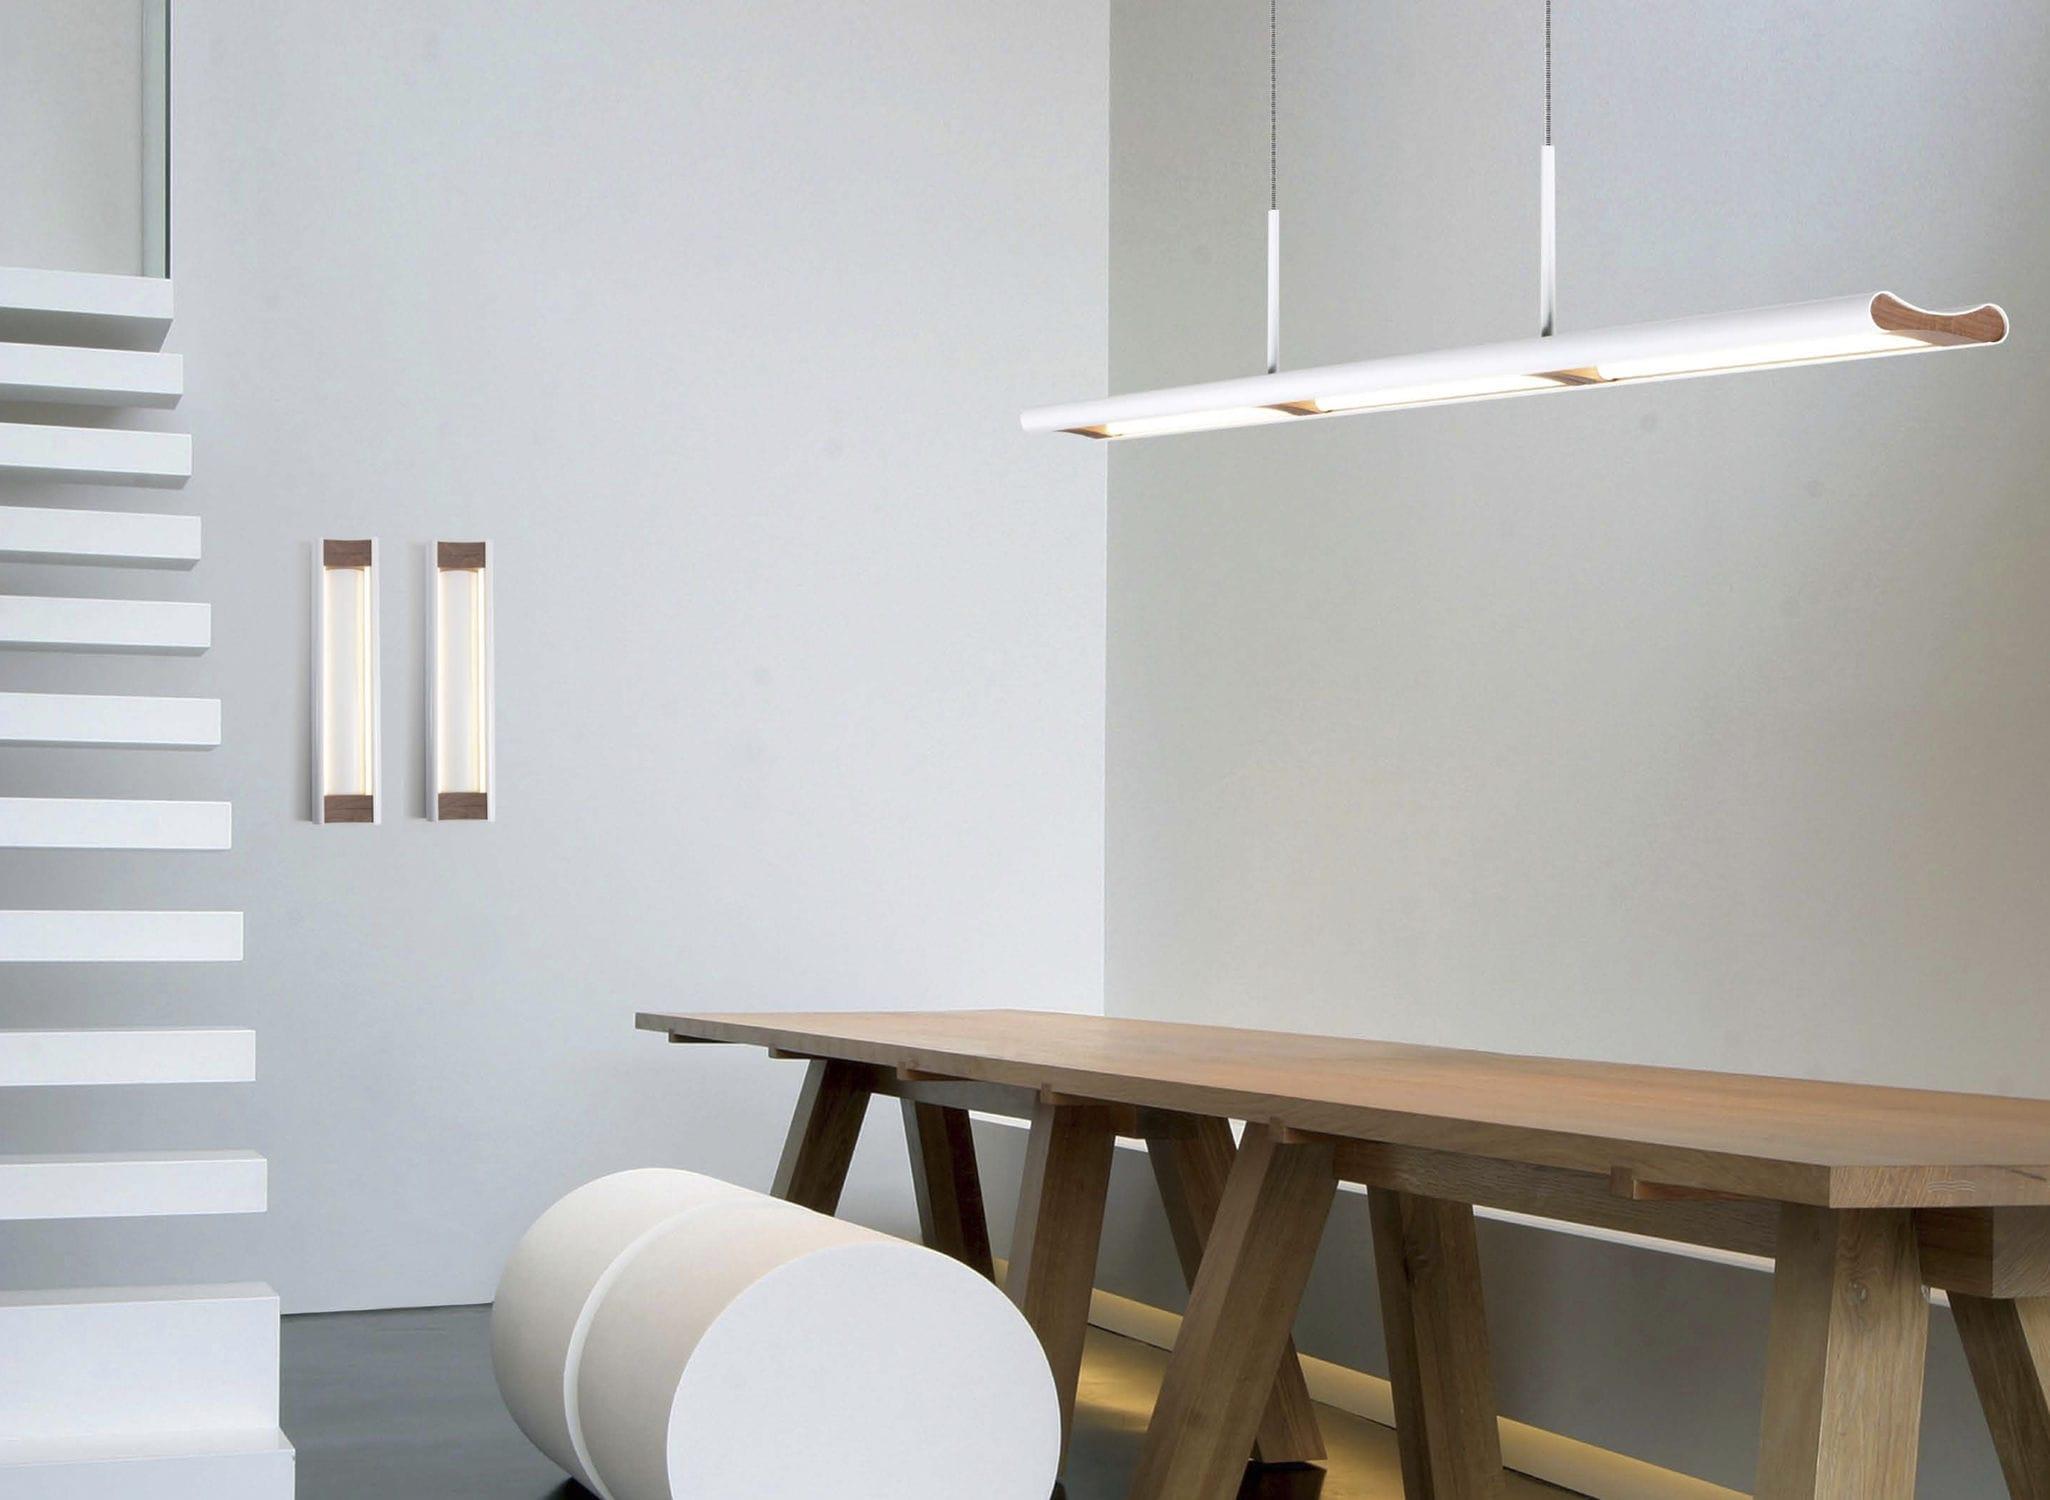 ... Contemporary wall light / aluminum / LED / linear POIROT by Bart Lens Eden Design B.V.B.A & Contemporary wall light / aluminum / LED / linear - POIROT by Bart ... azcodes.com